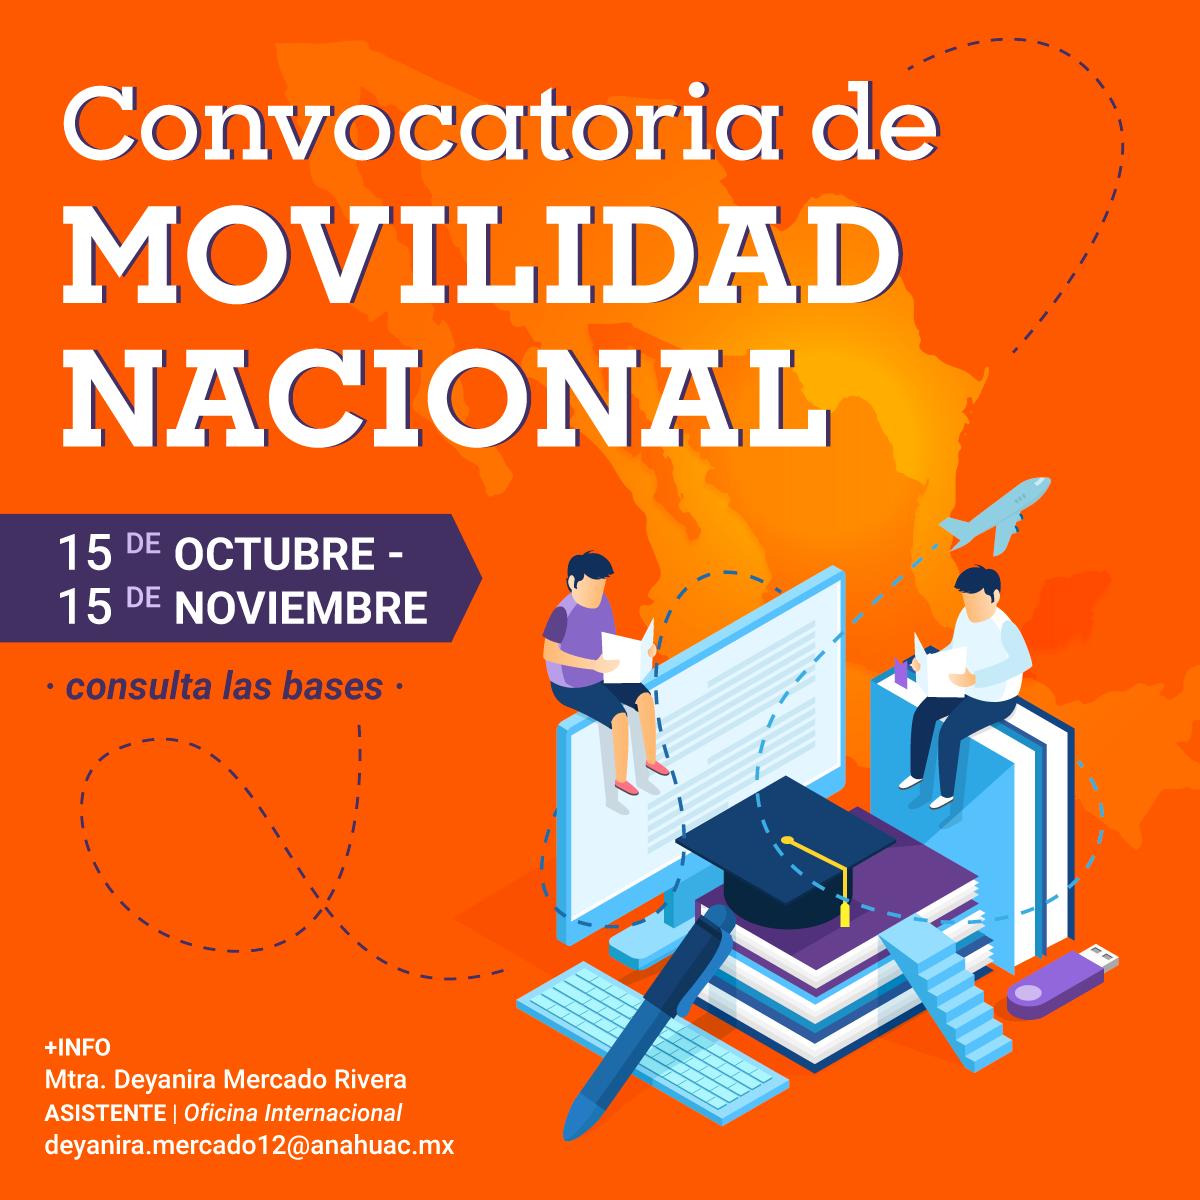 Convocatoria de Movilidad Nacional 2021